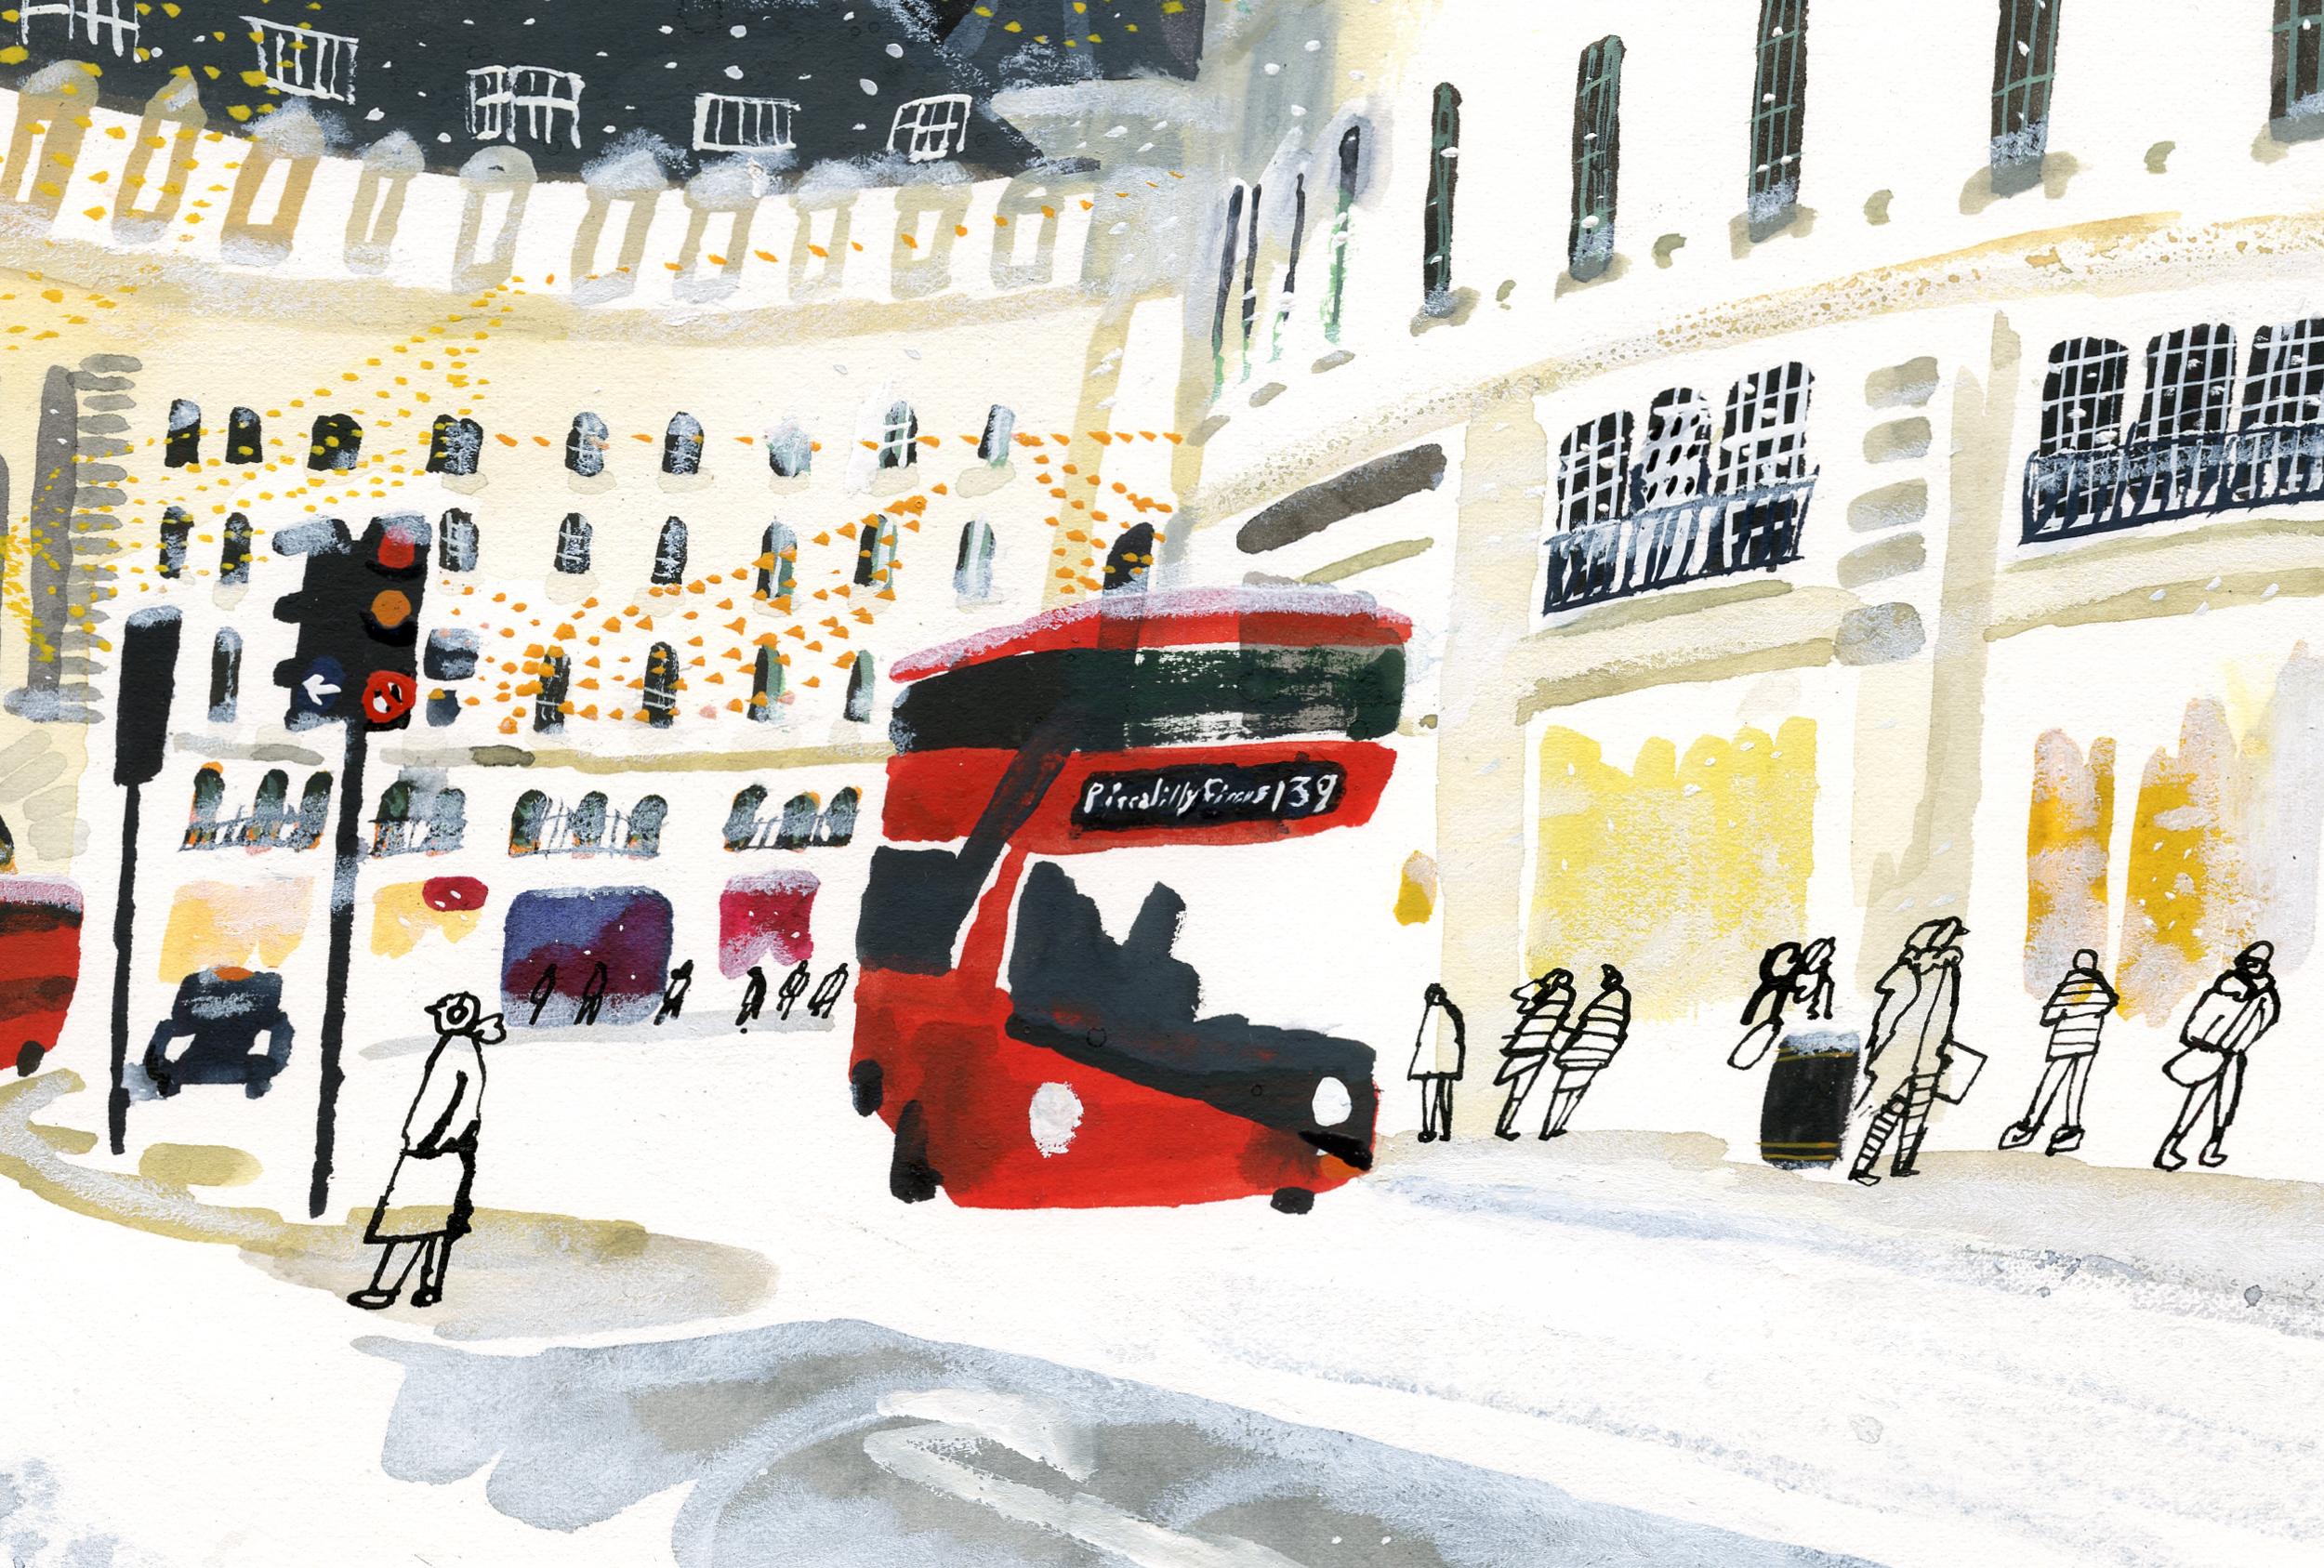 Regent Street by James Oses, image 4